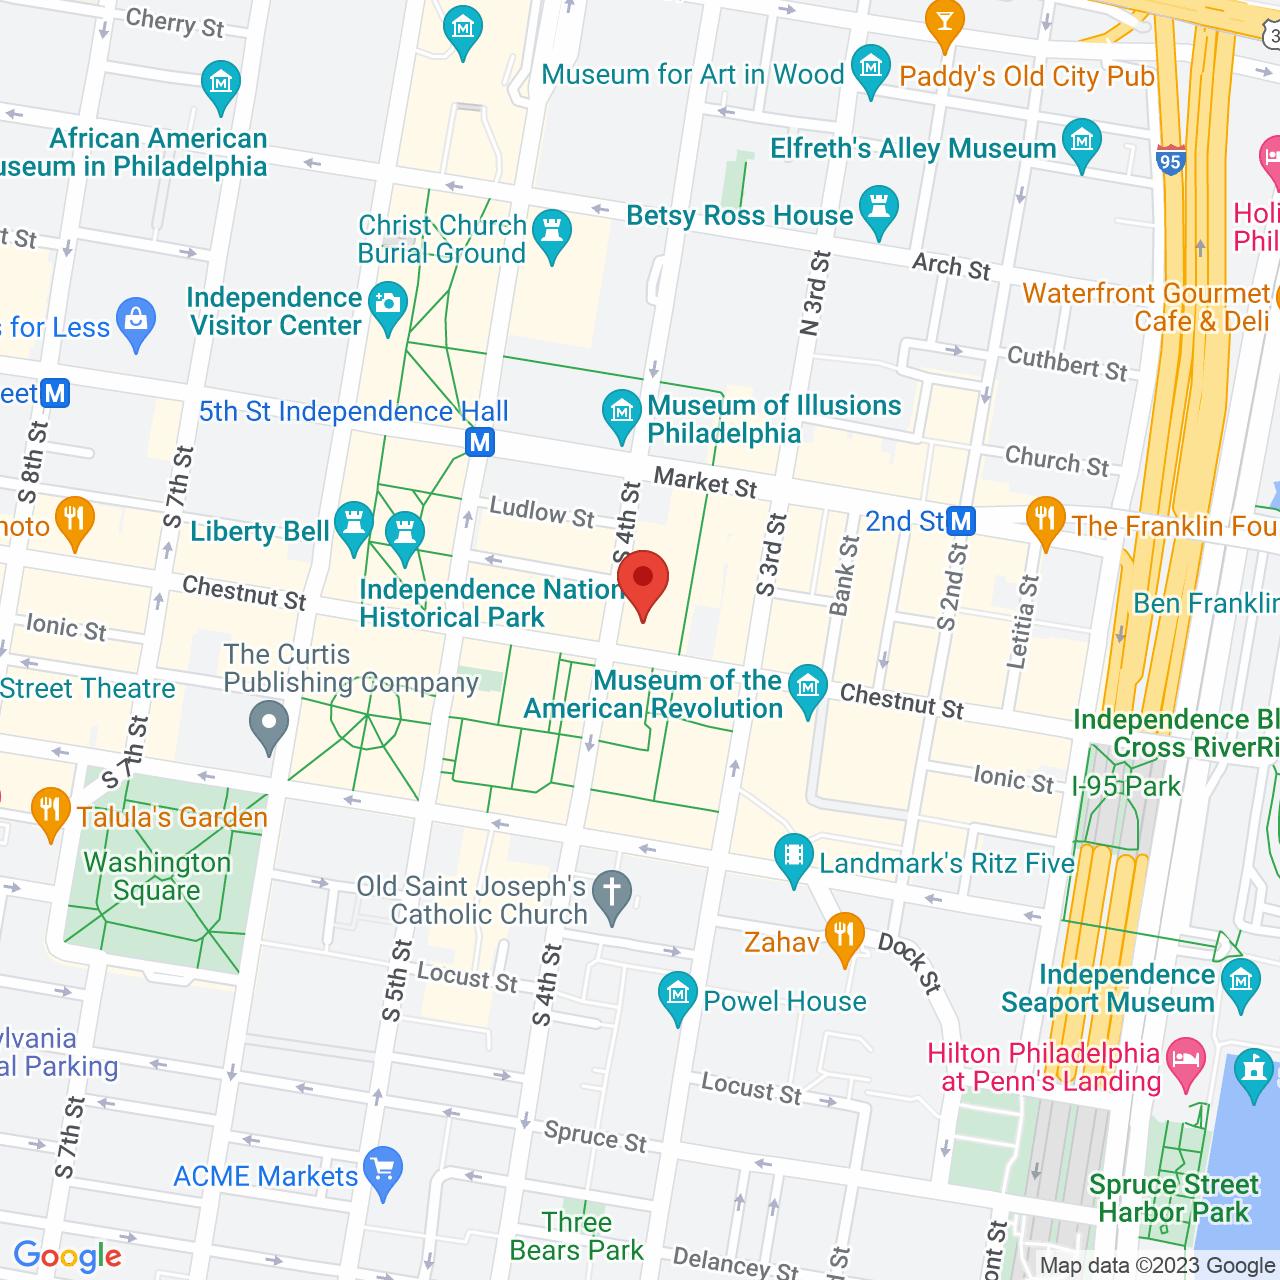 325 Chestnut Street, Suite 900, Philadelphia, PA 19106, United States